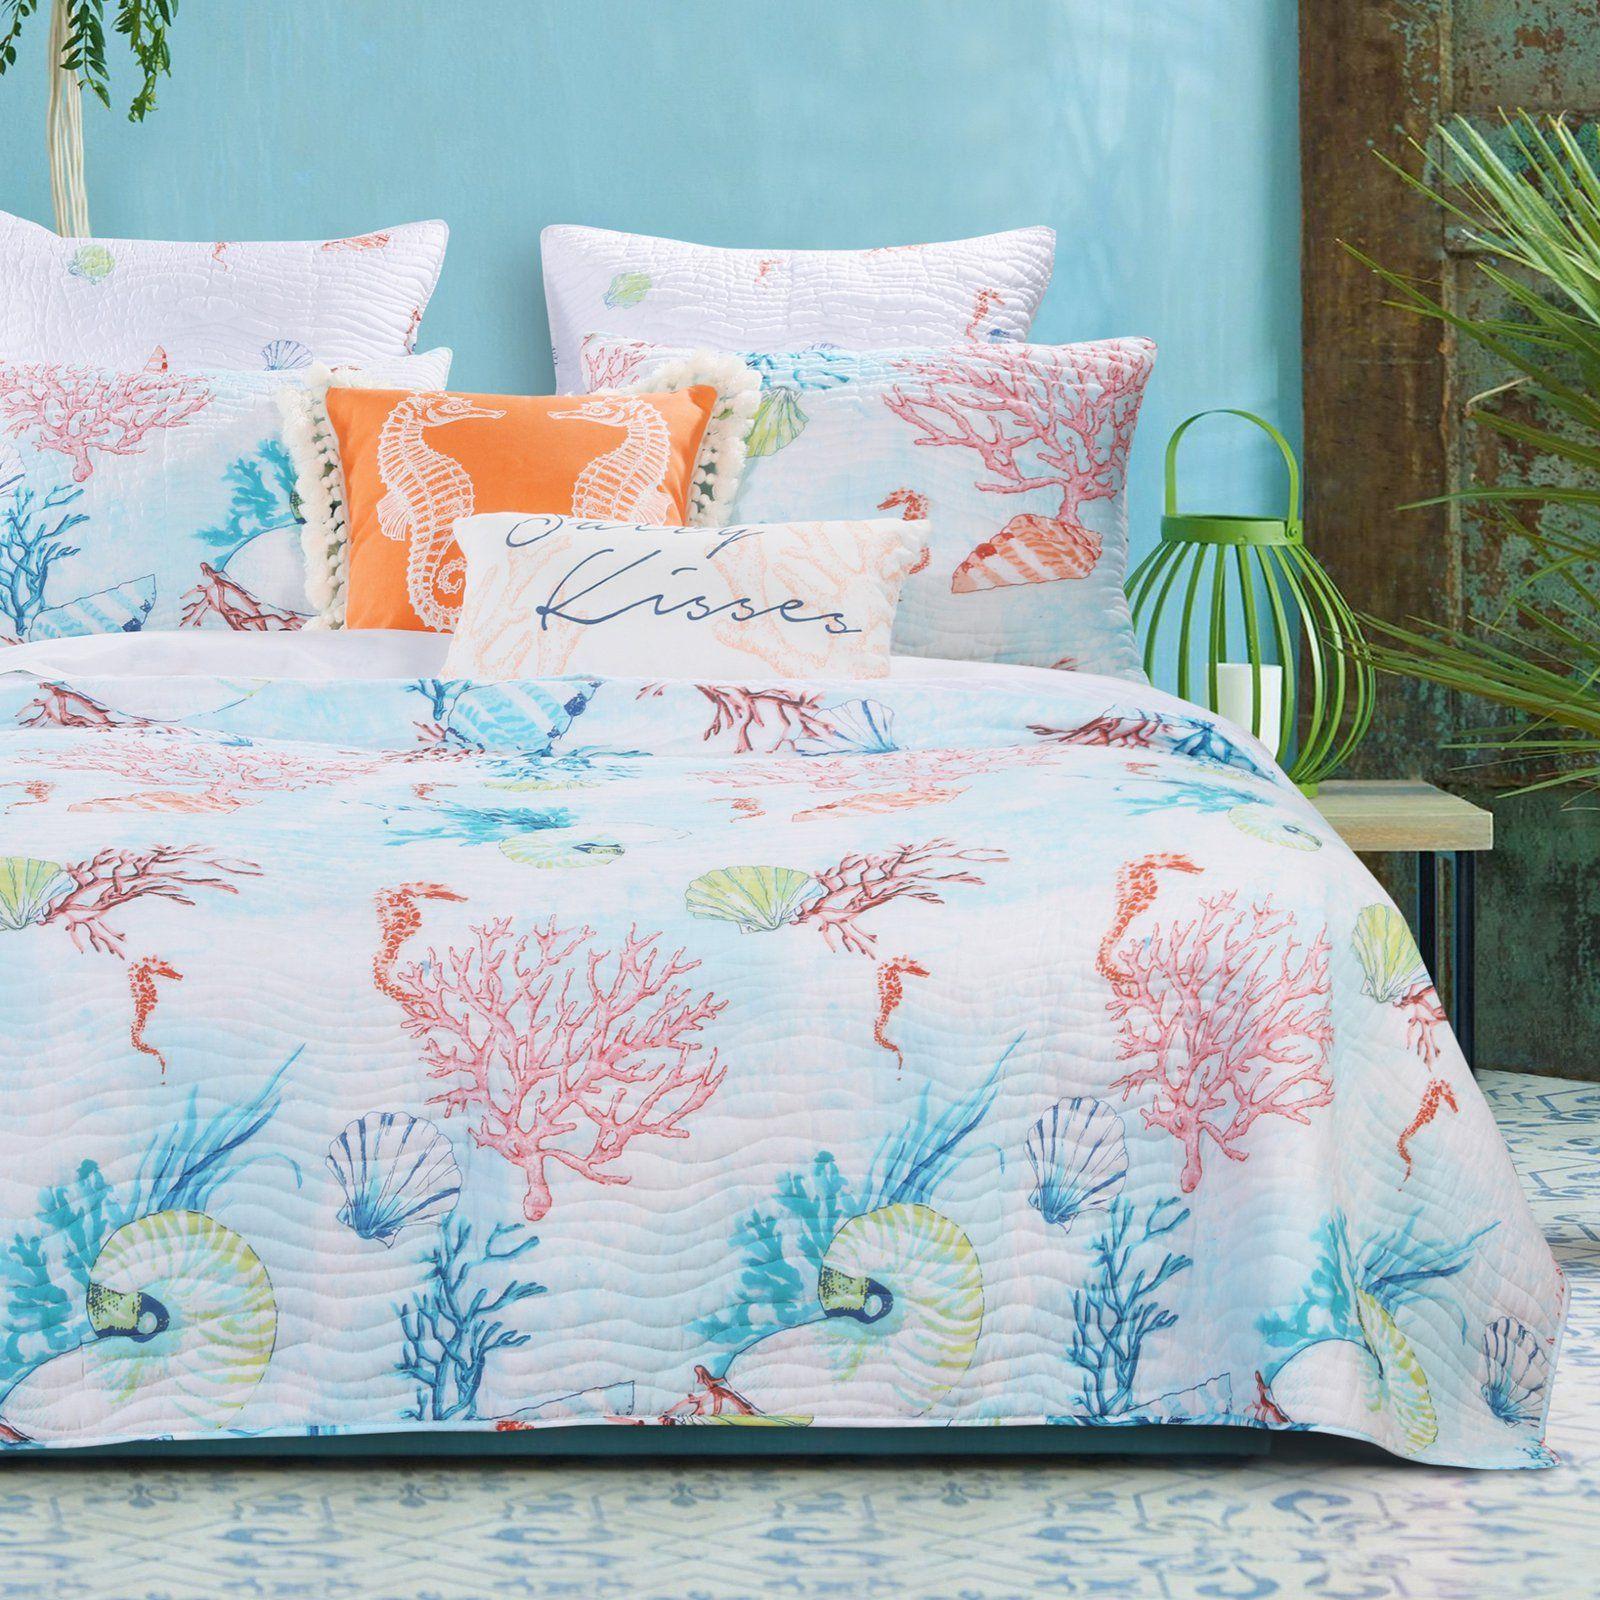 Sarasota Quilt Set By Barefoot Bungalow Size King Quilt Sets